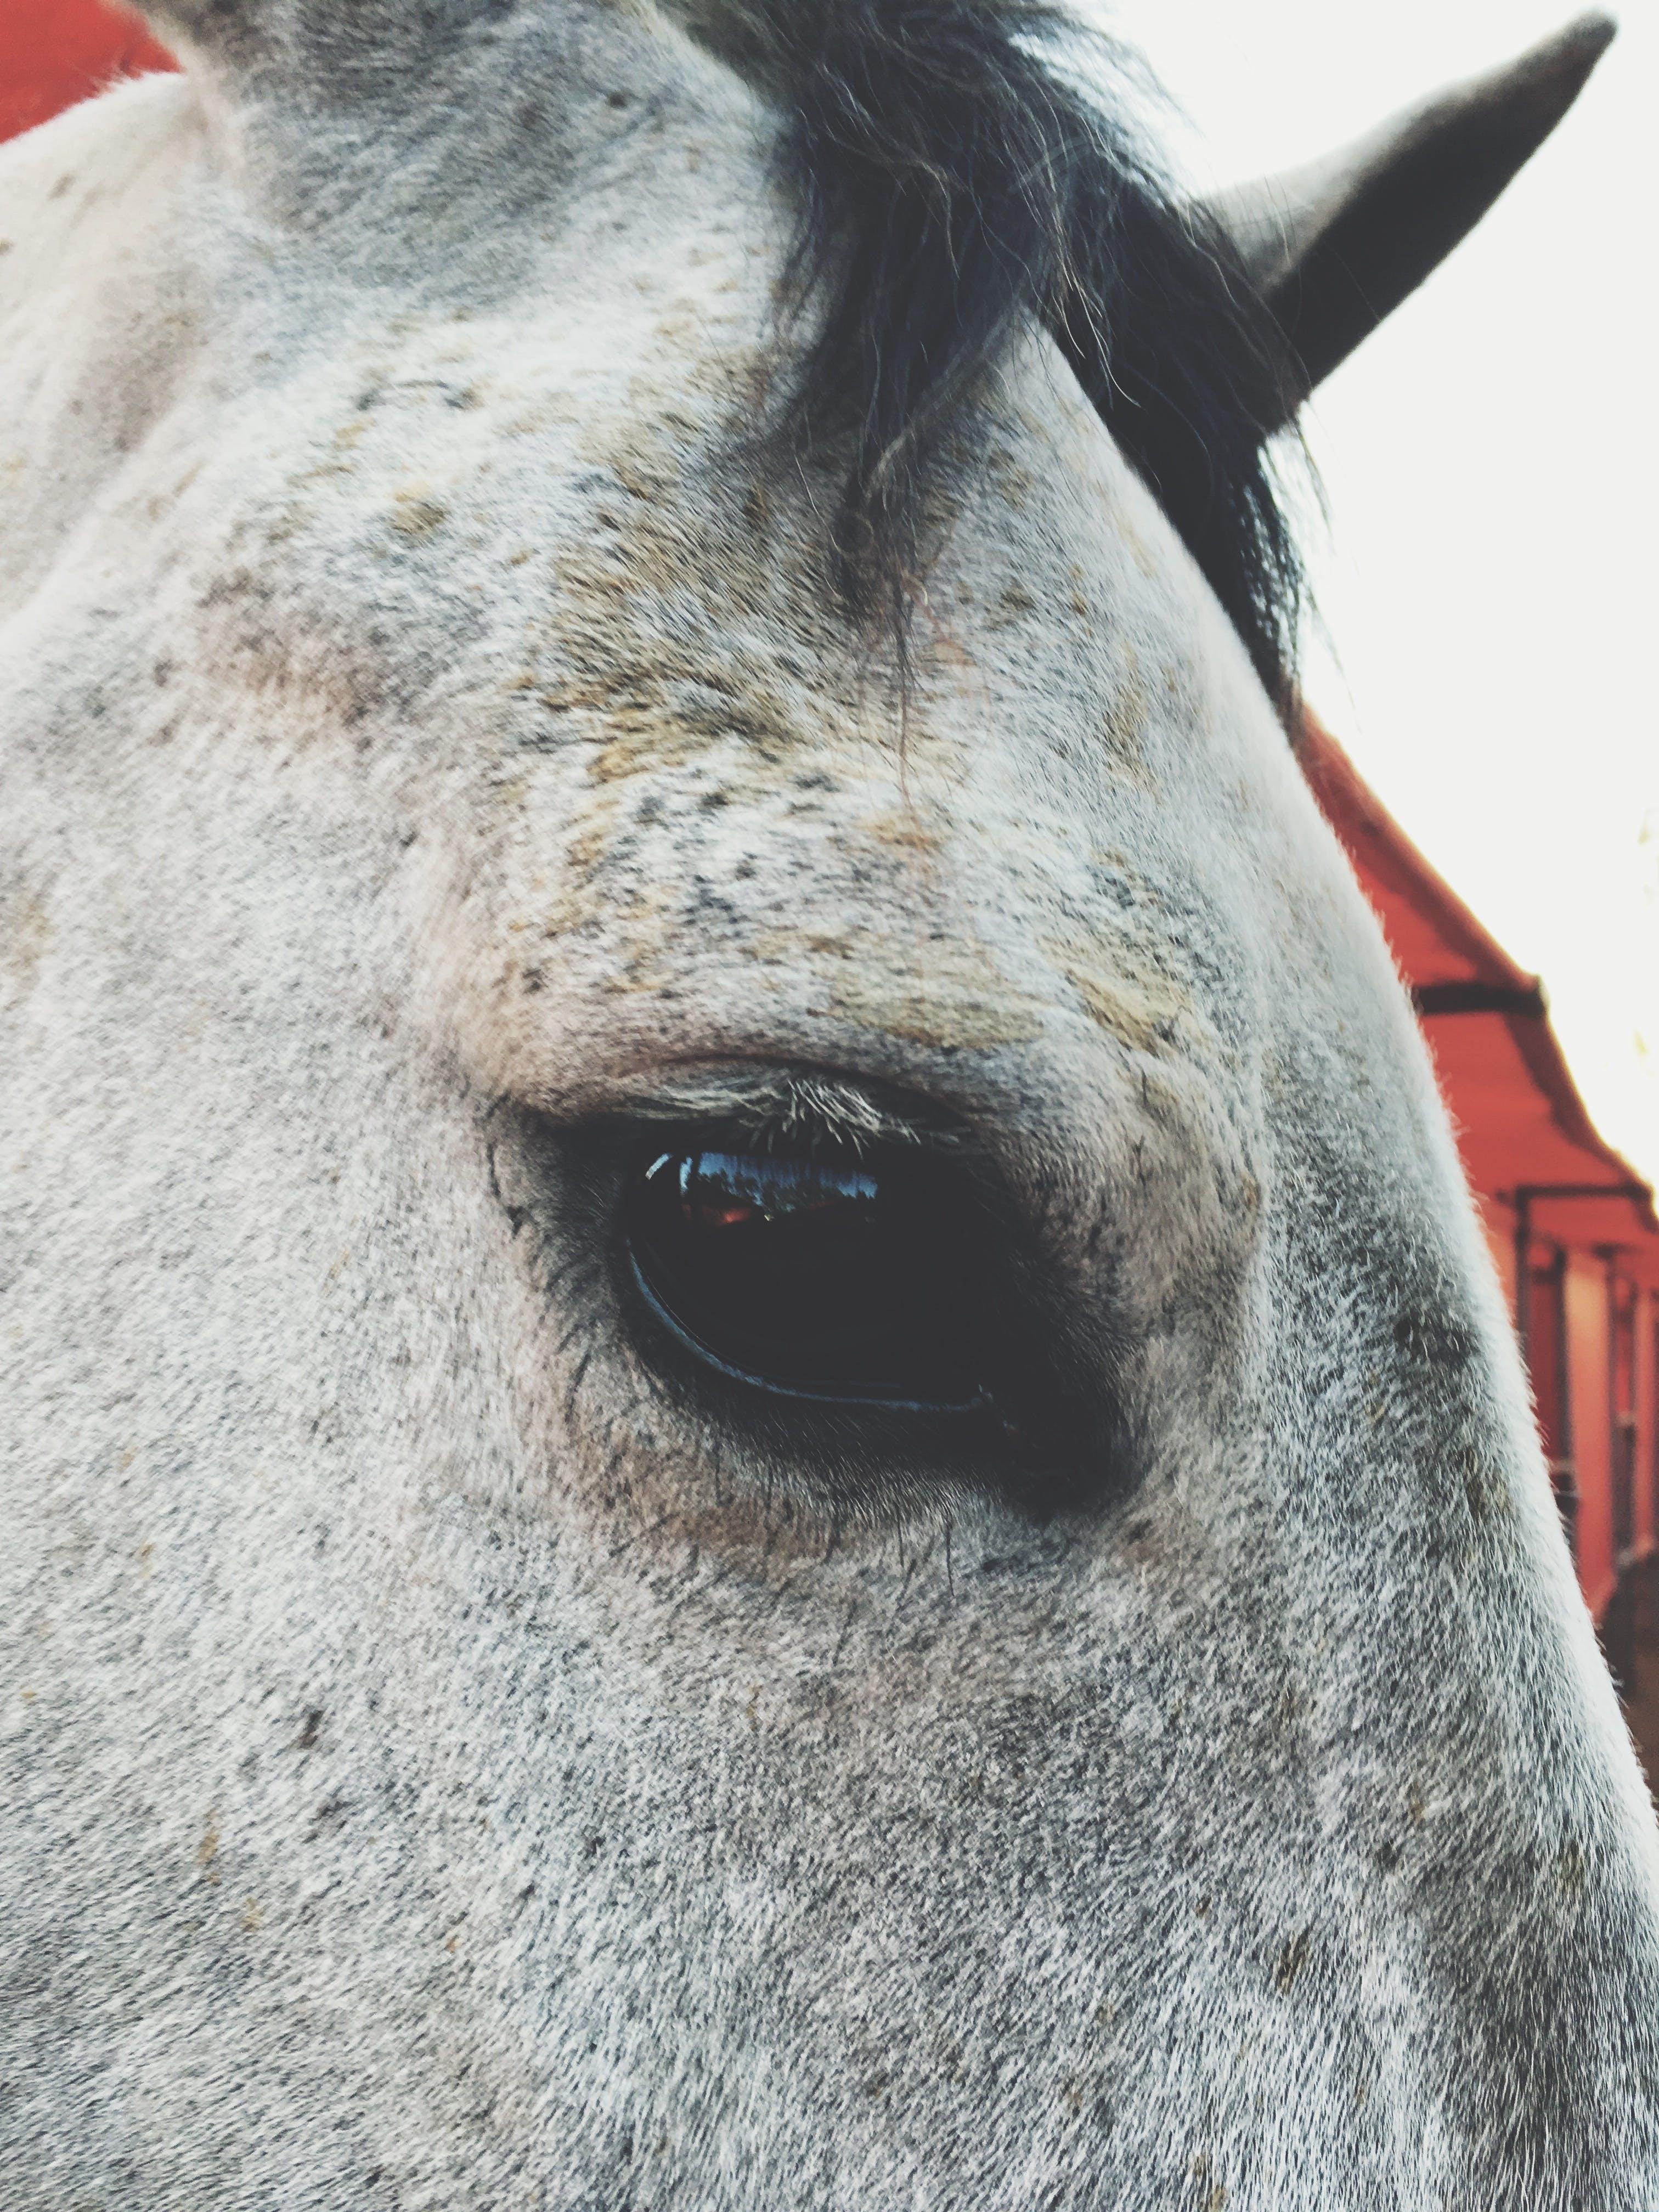 Kostenloses Stock Foto zu mobilechallenge, pferd, tier